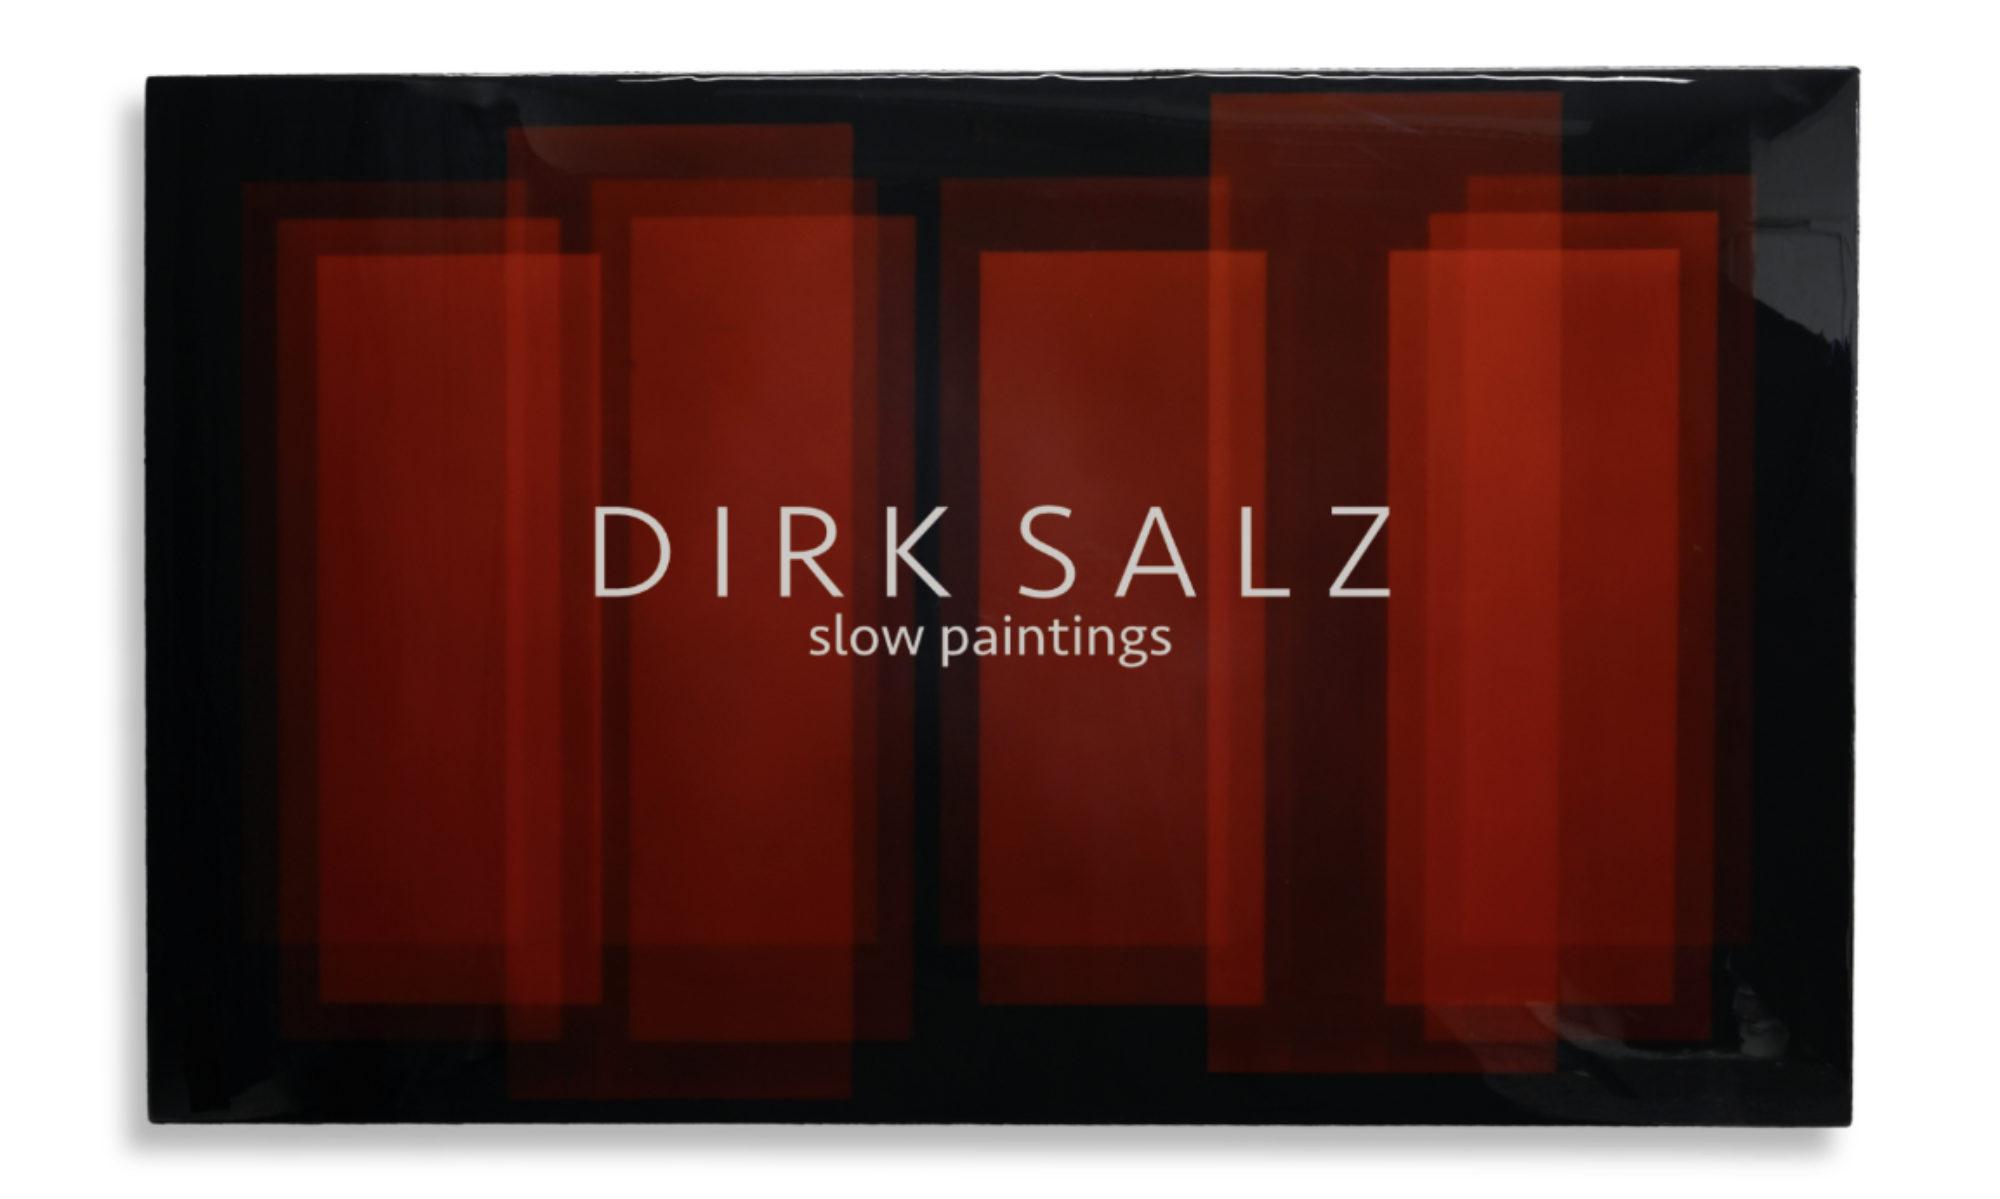 Dirk Salz